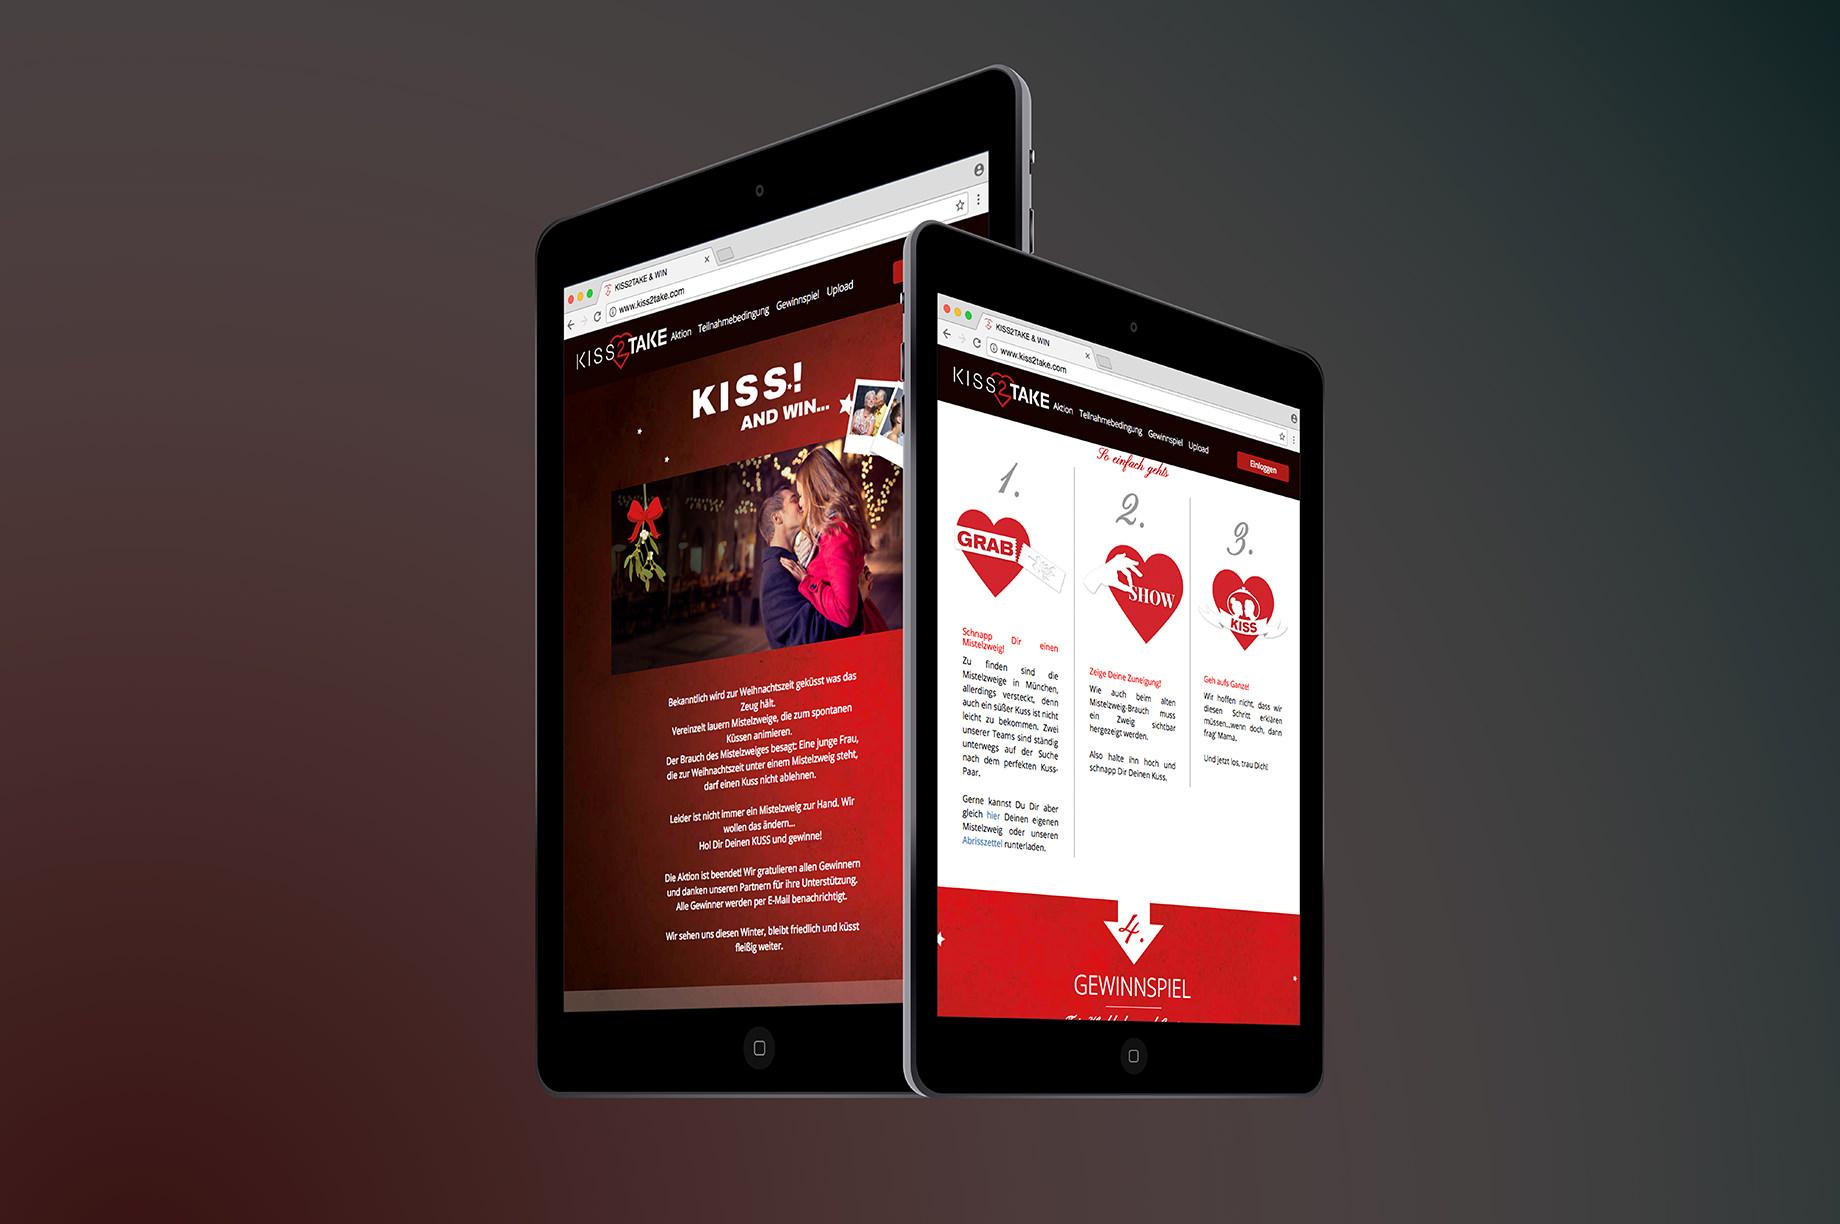 Tablet Website Kiss 2 Take